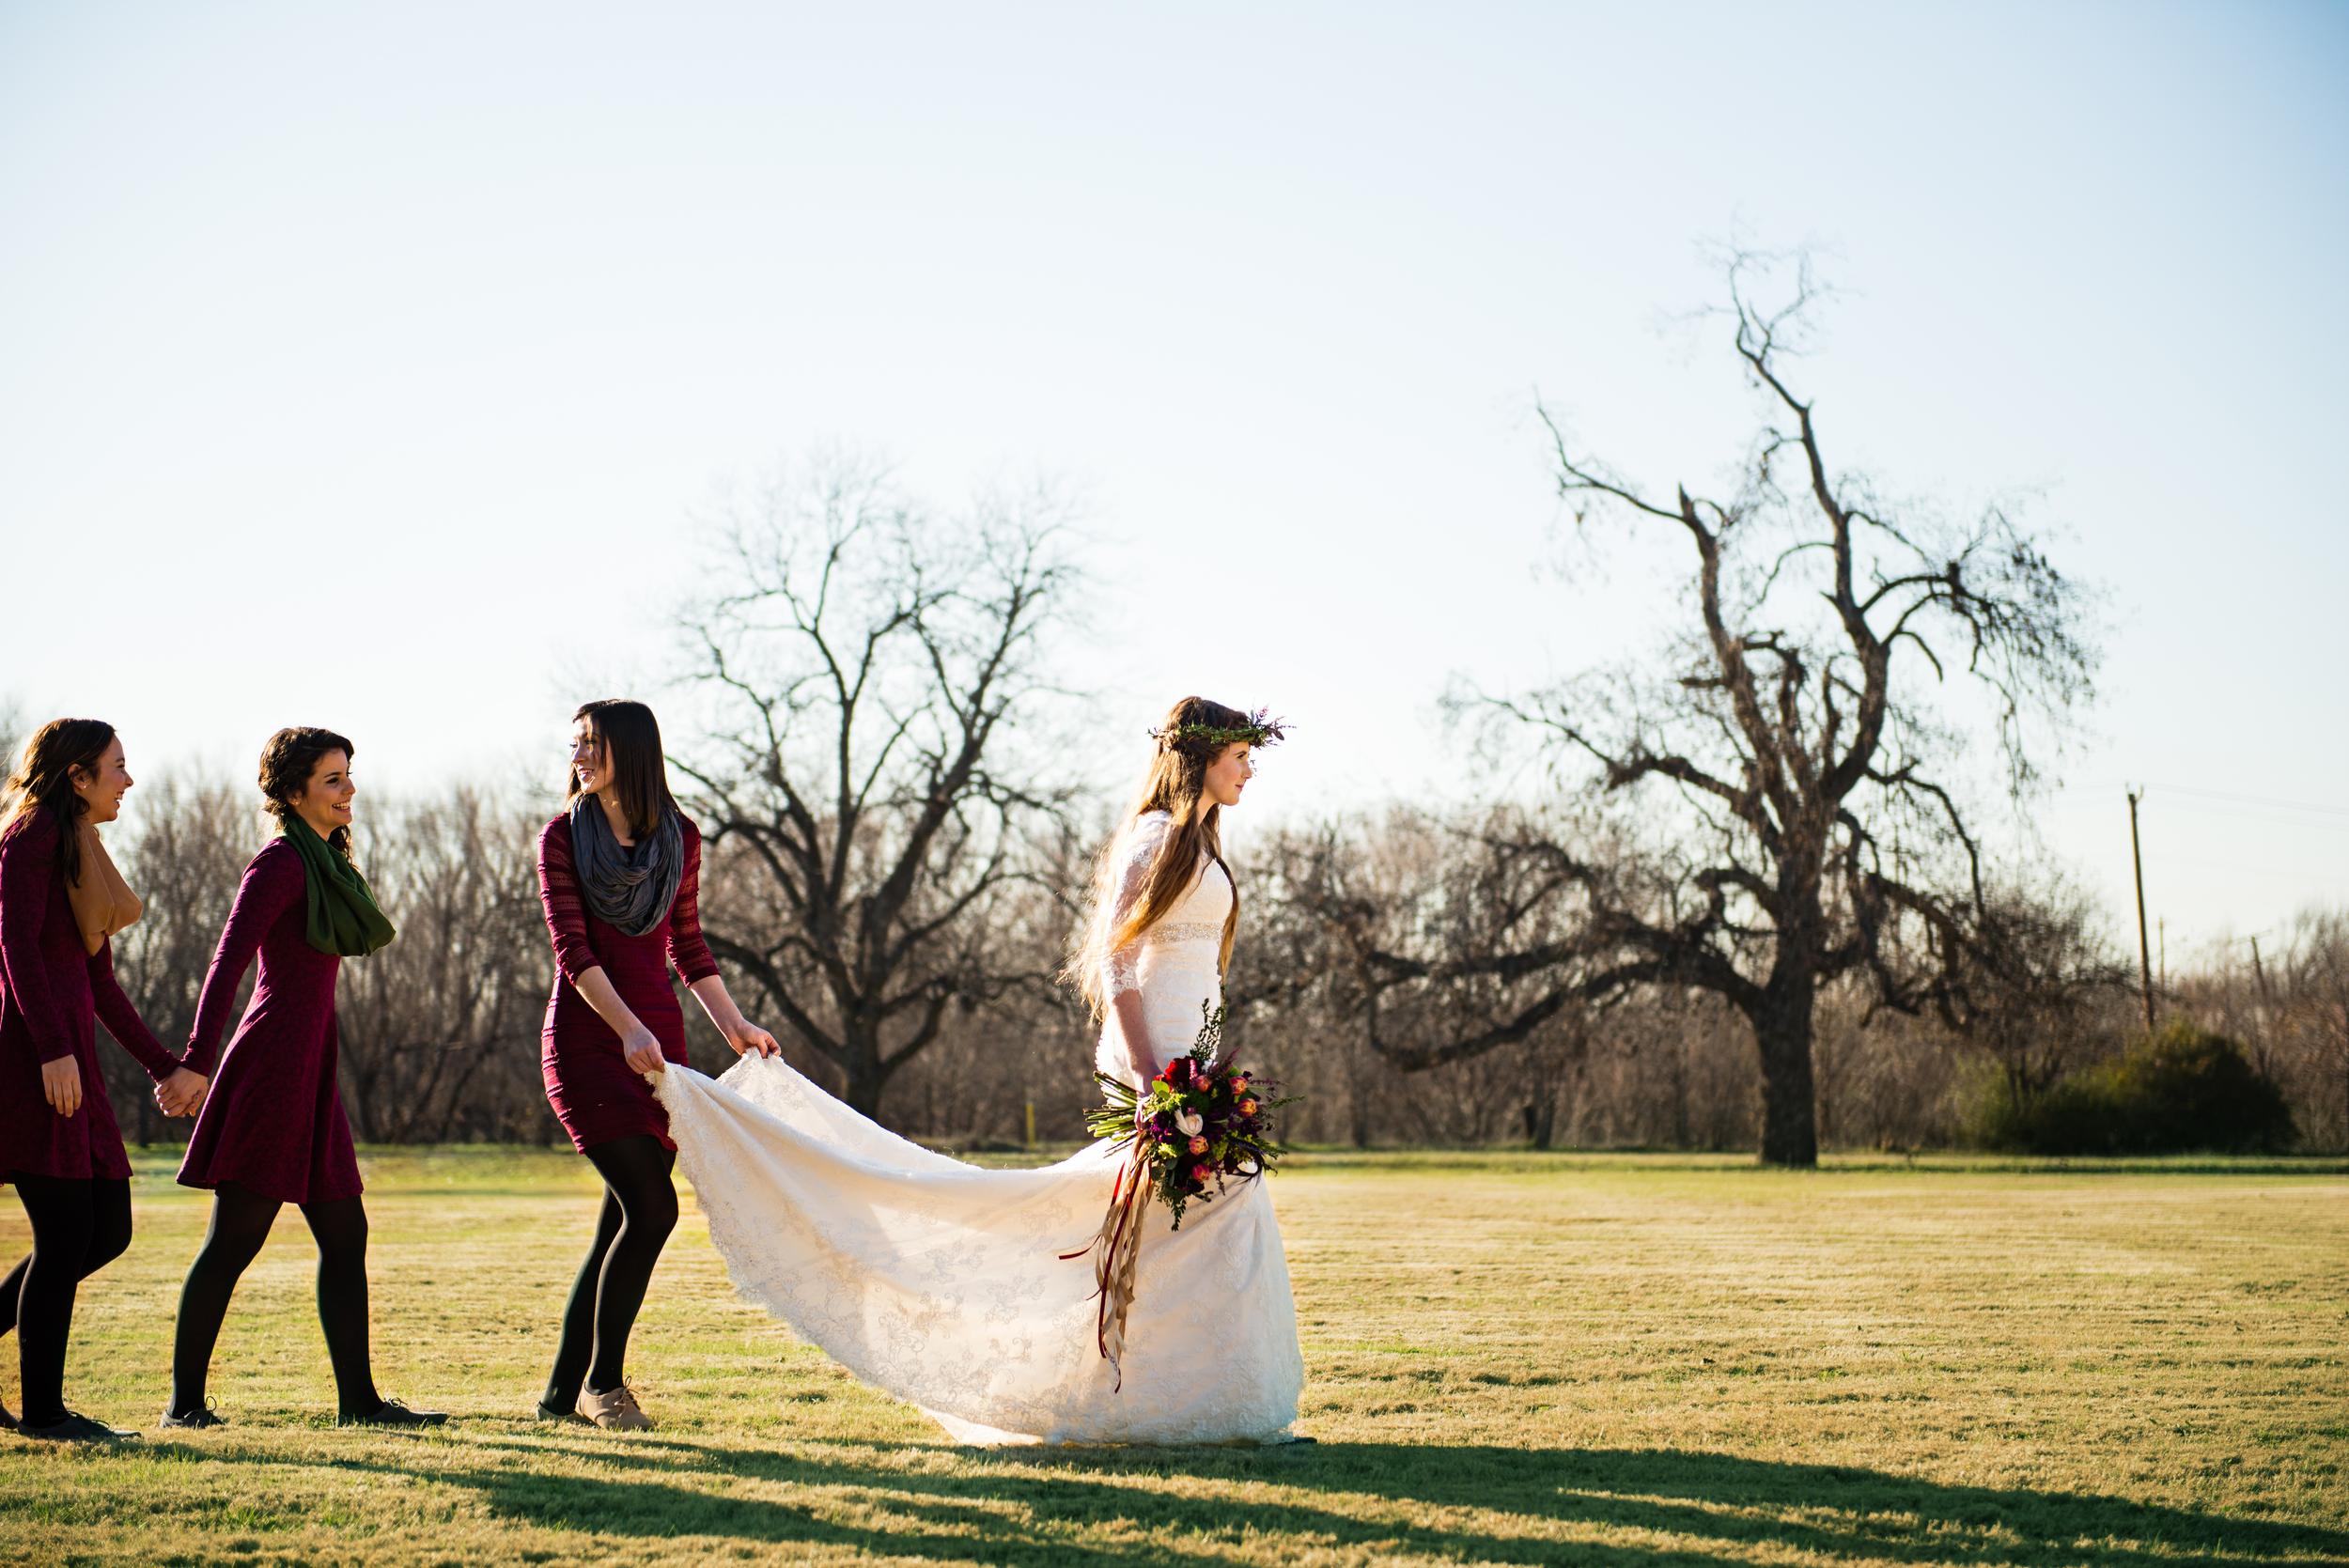 Boho Chic Styled Wedding- The Inspired Bride